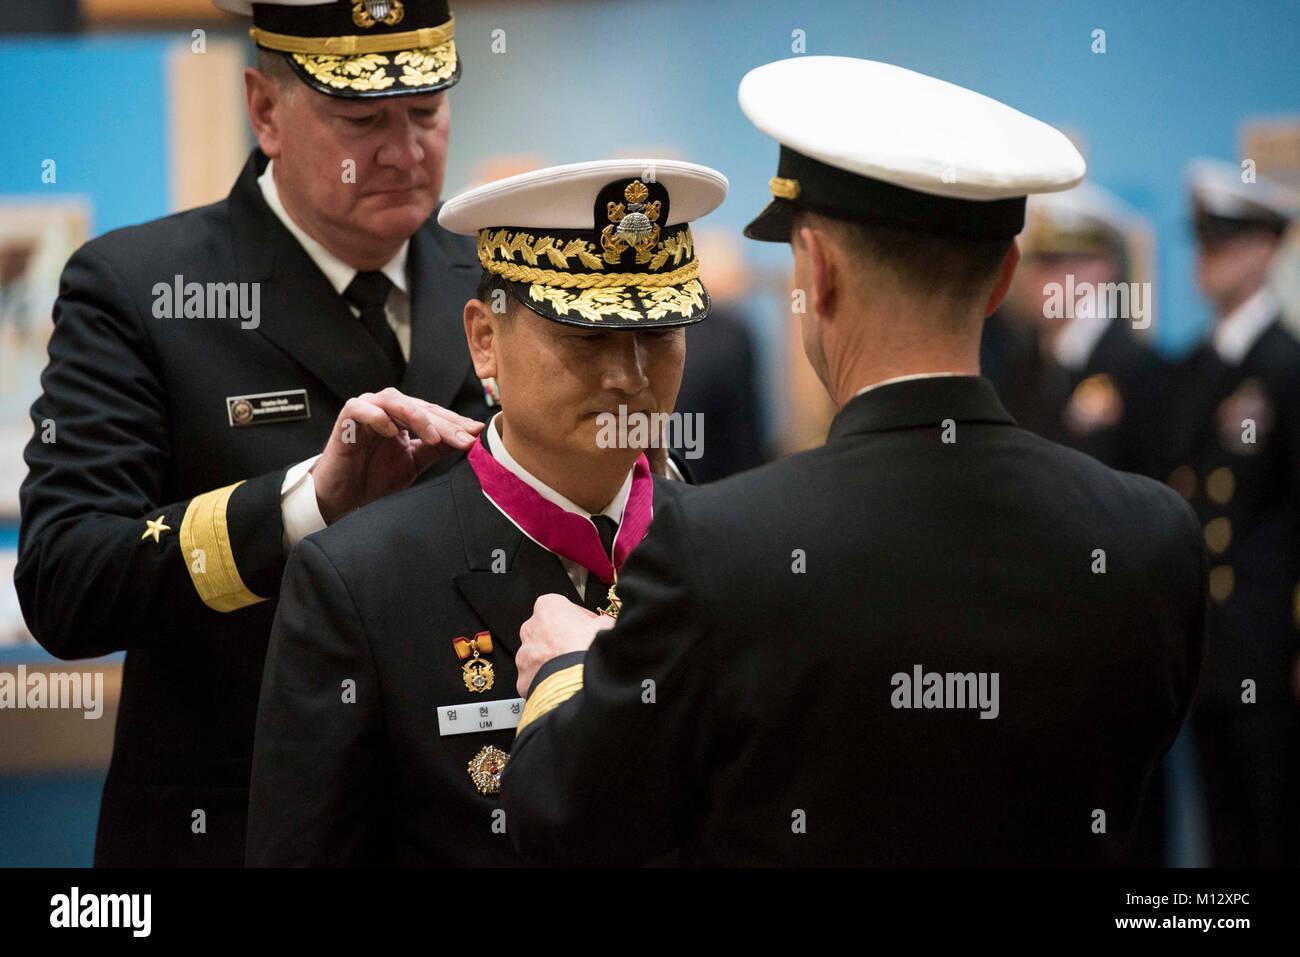 WASHINGTON, (Jan  22, 2018) Chief of Naval Operations Adm